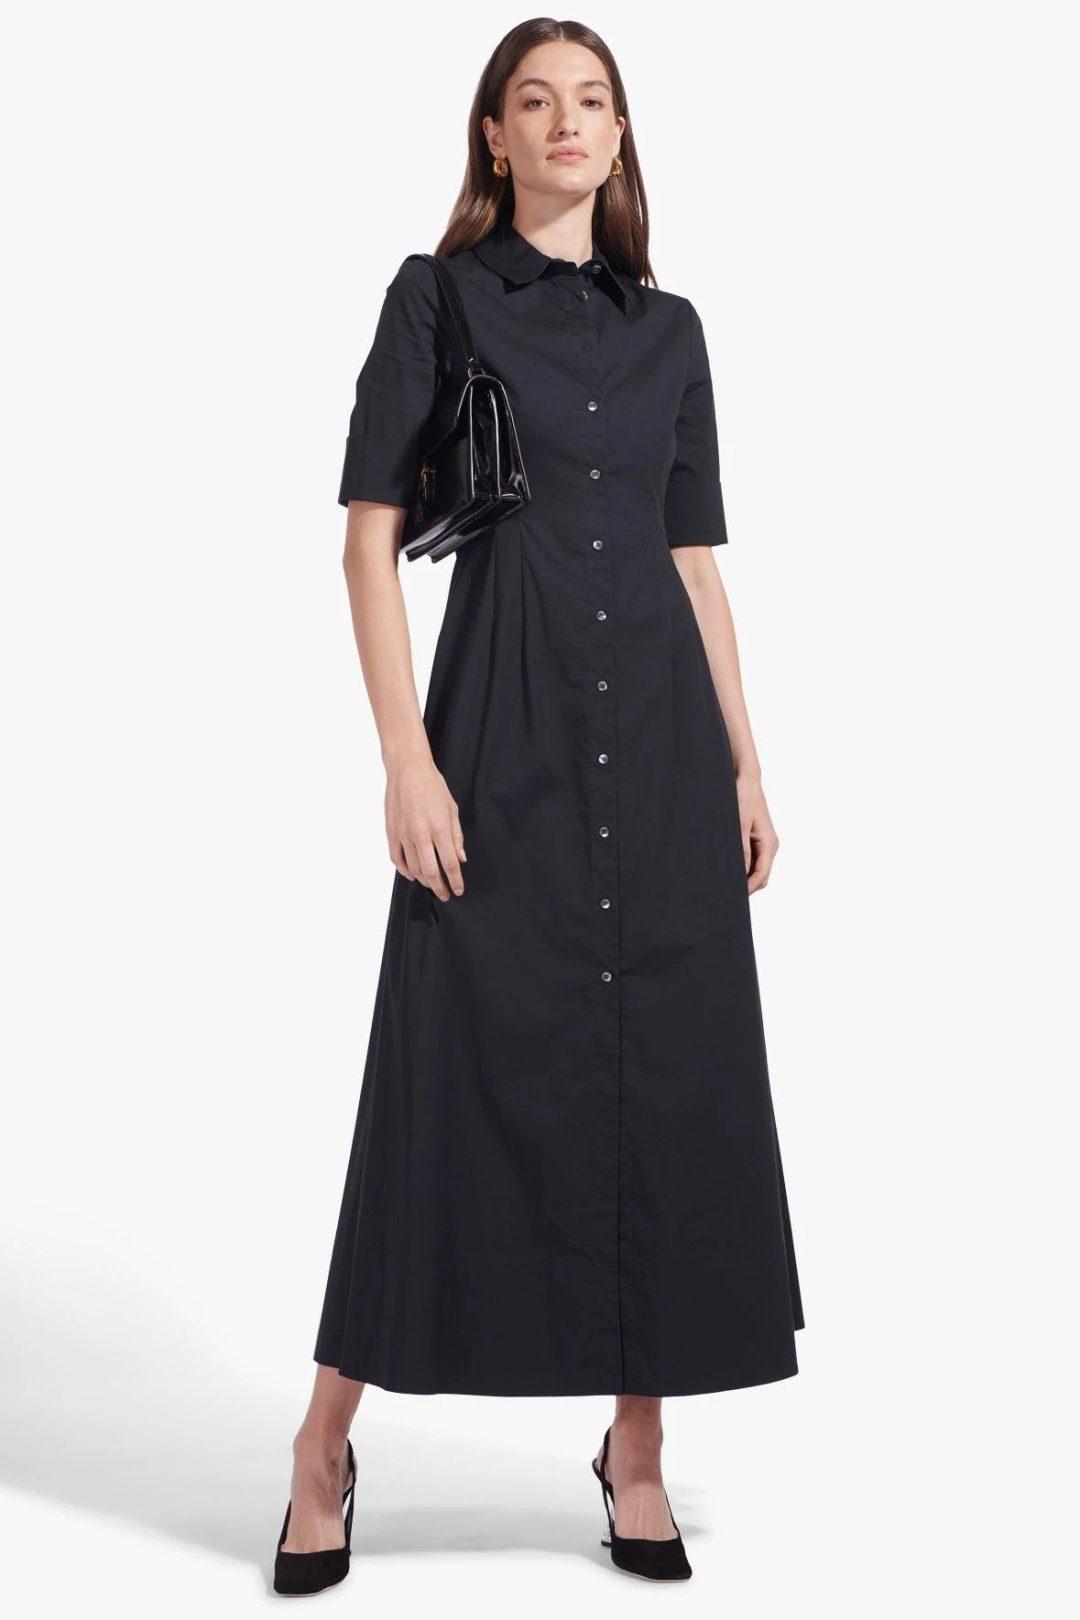 Navy blue collared maxi dress